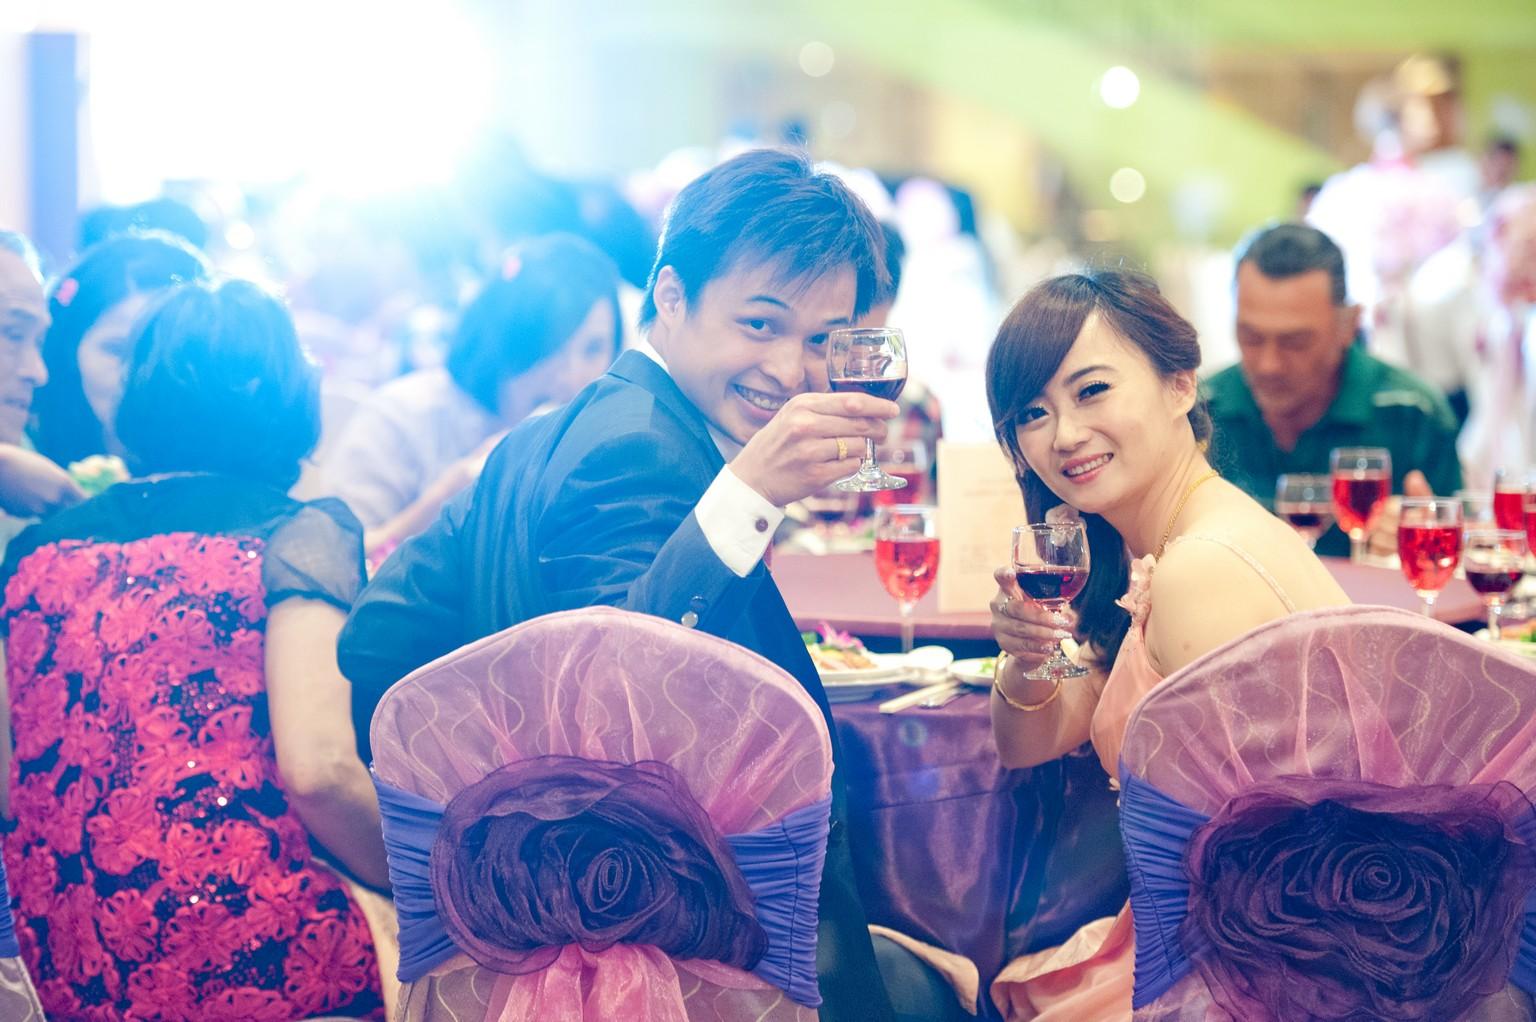 wedding-photo-000019